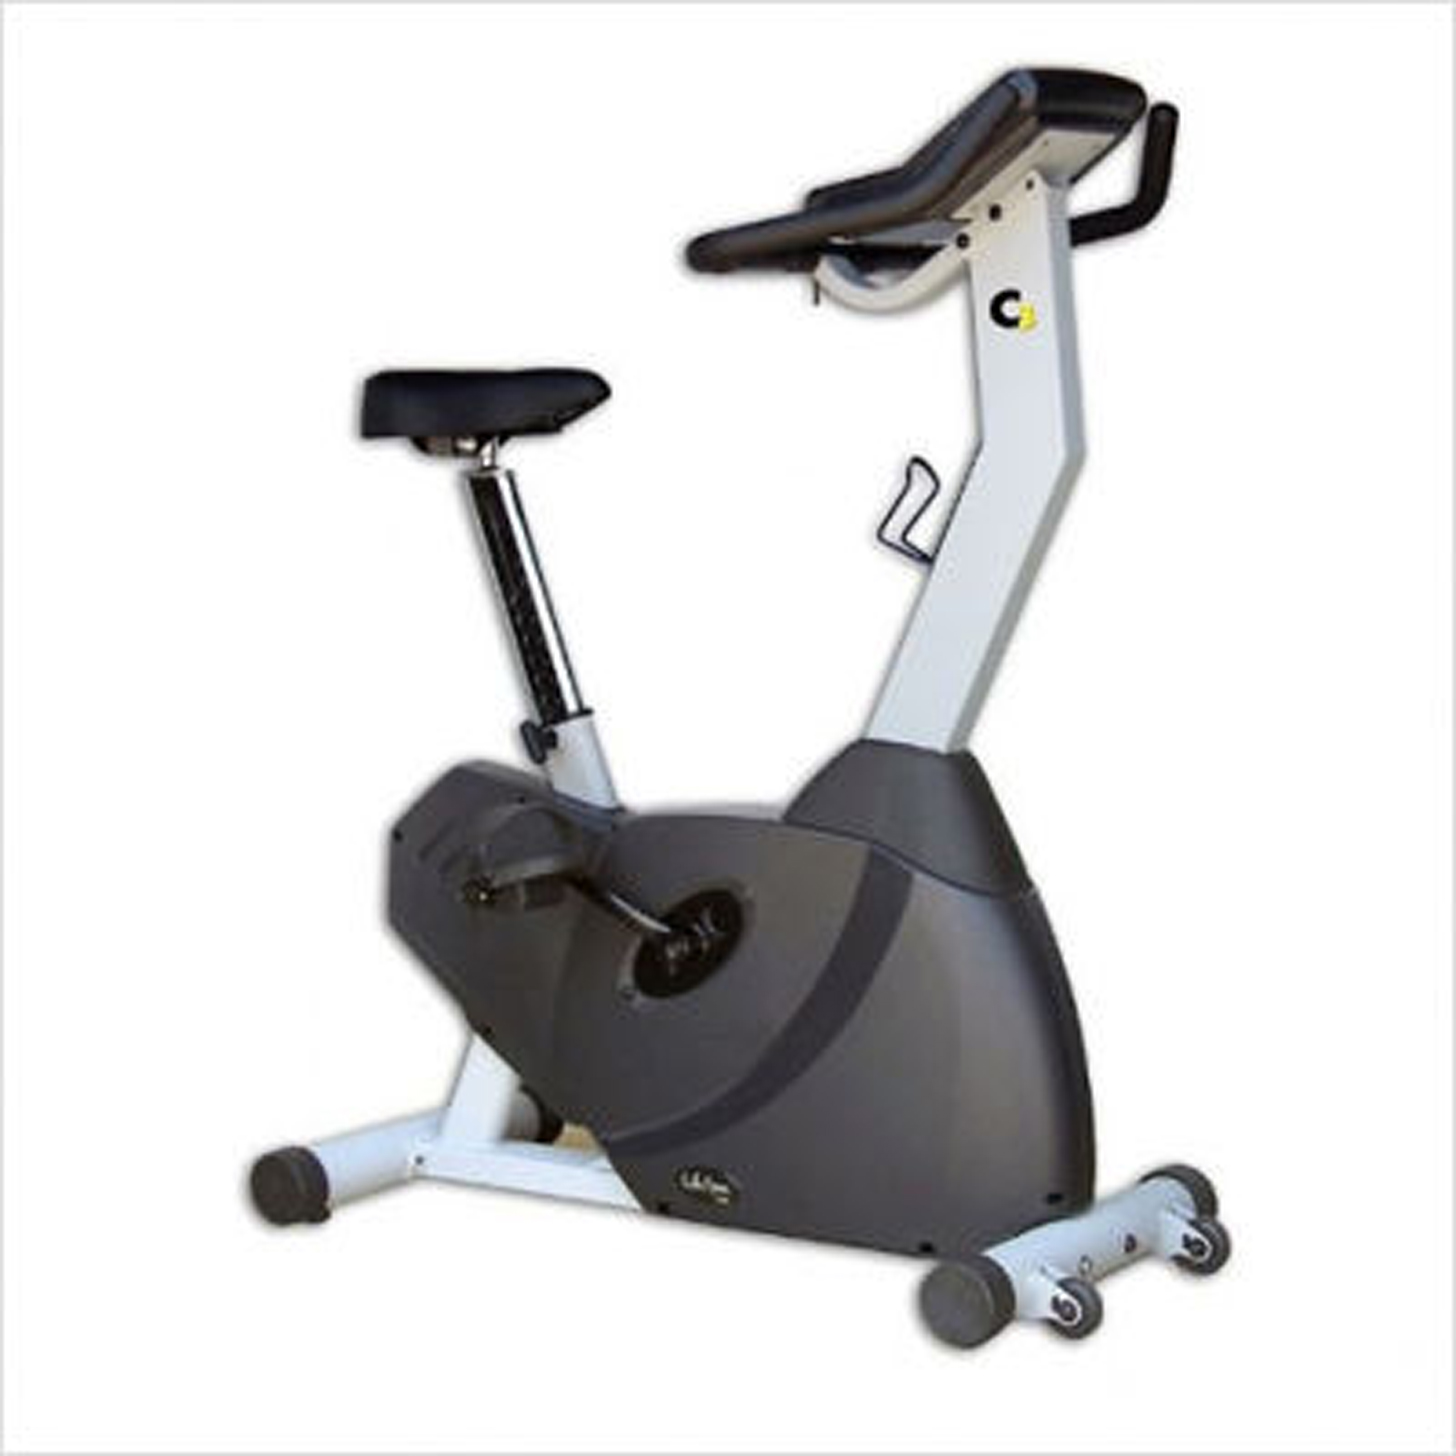 lifespan fitness lifespan c3 upright exercise bike upright bike 0 0 LifeSpan Fitness C3 Upright Exercise Bike